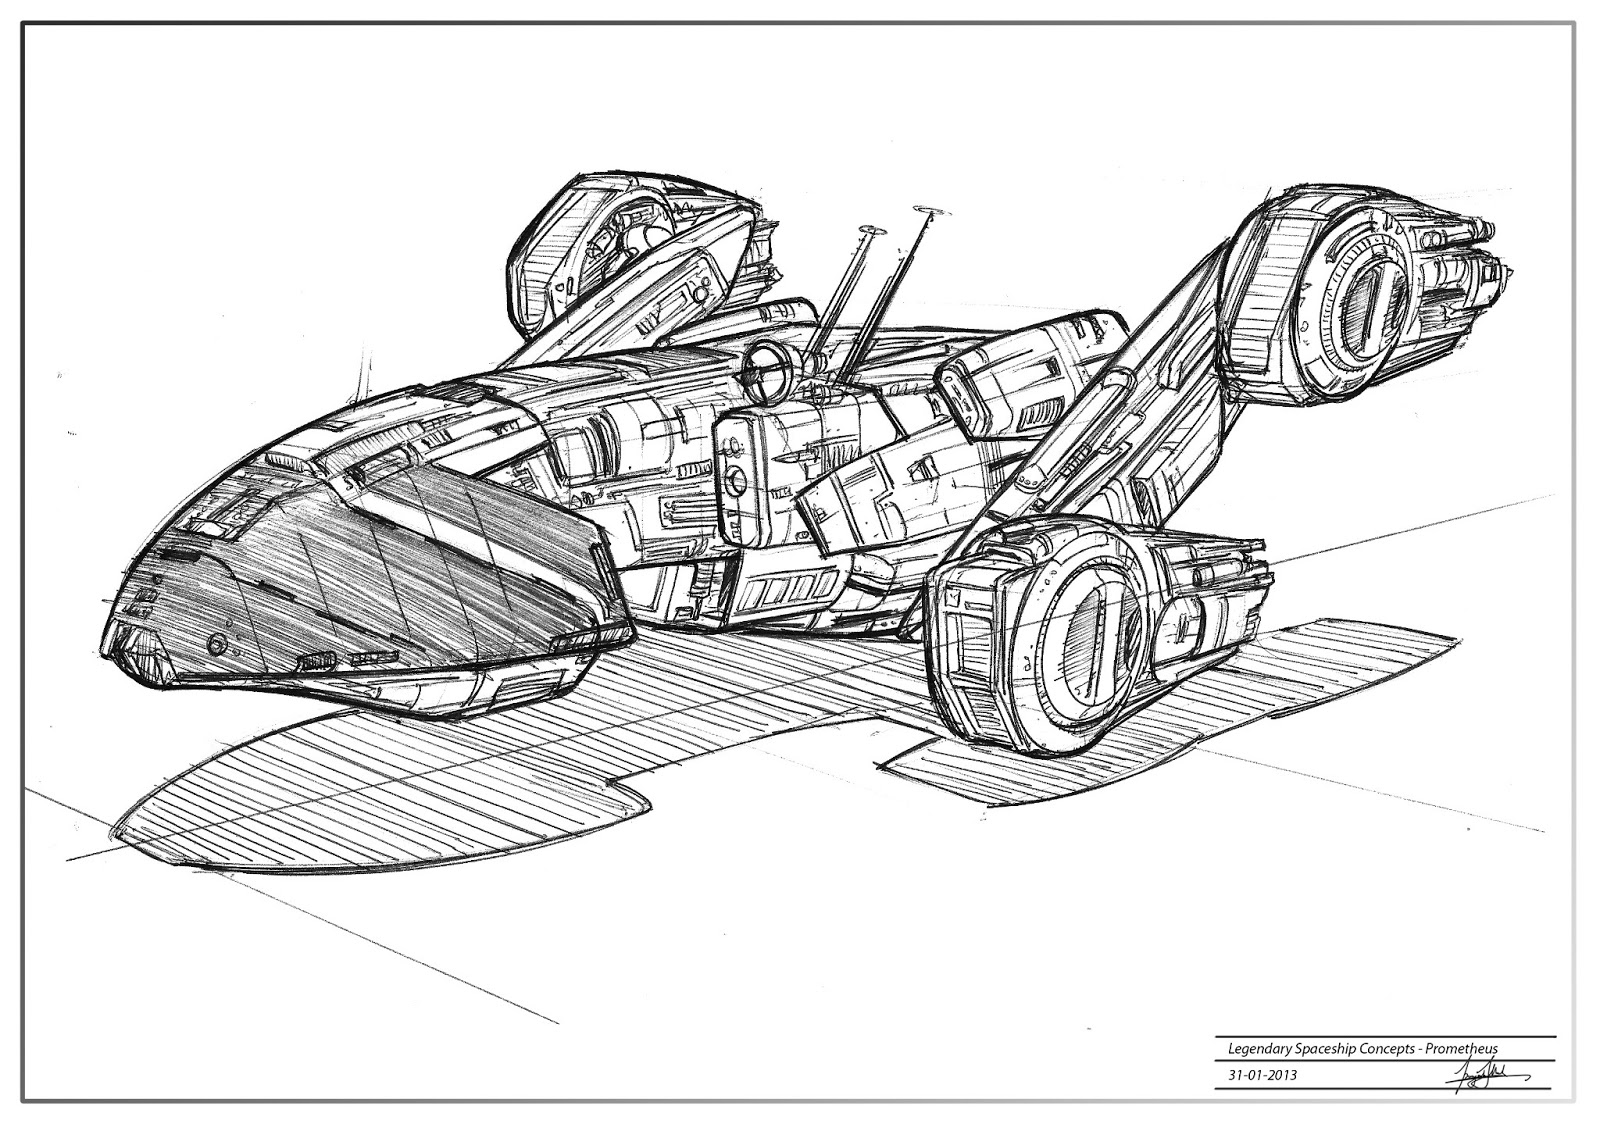 Grandpriy: Legendary Spaceships